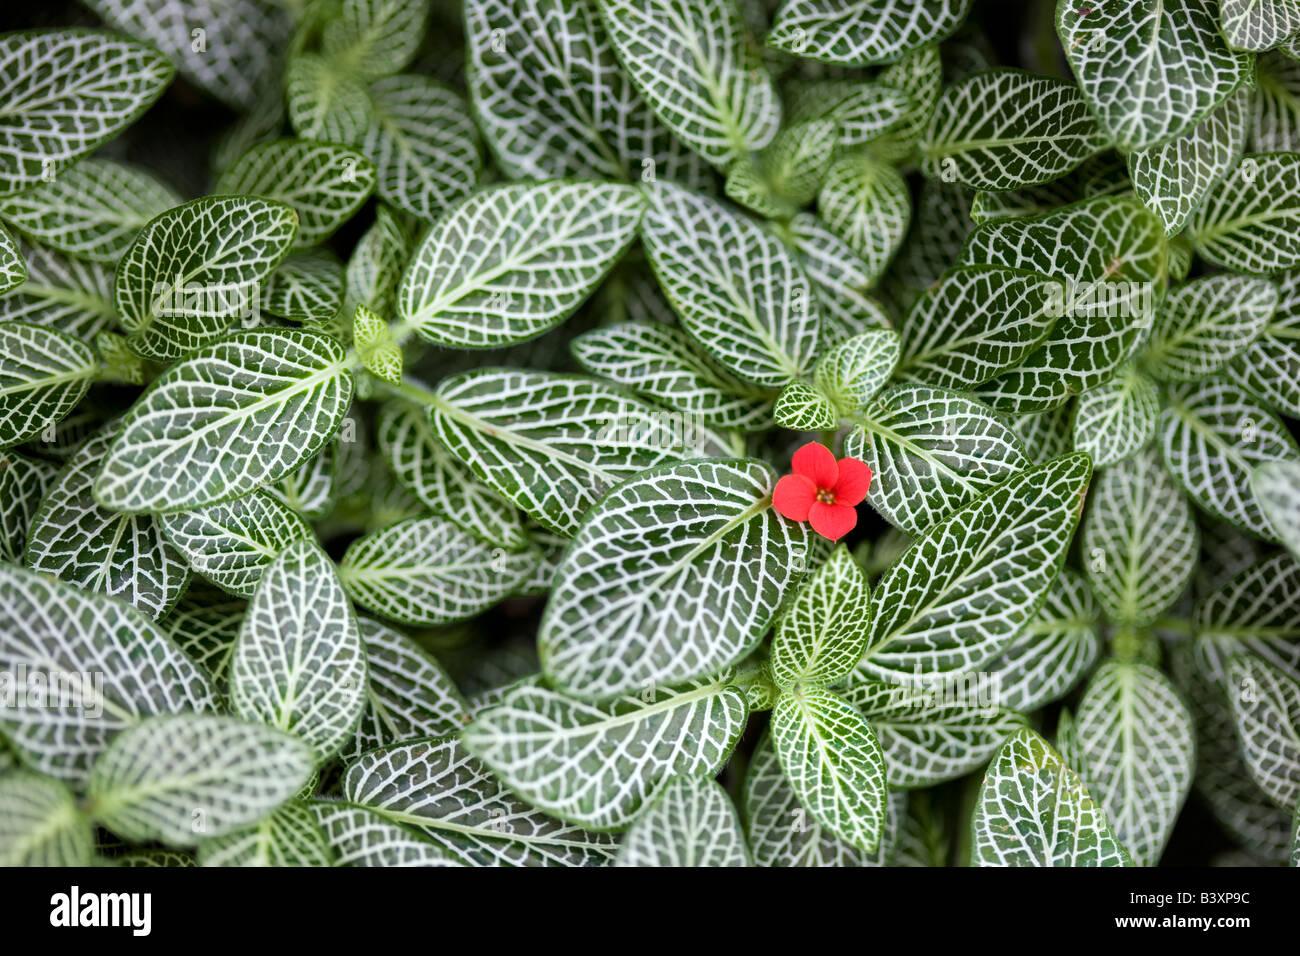 Fitotonia HB hautnah mit rote Blume Stockfoto